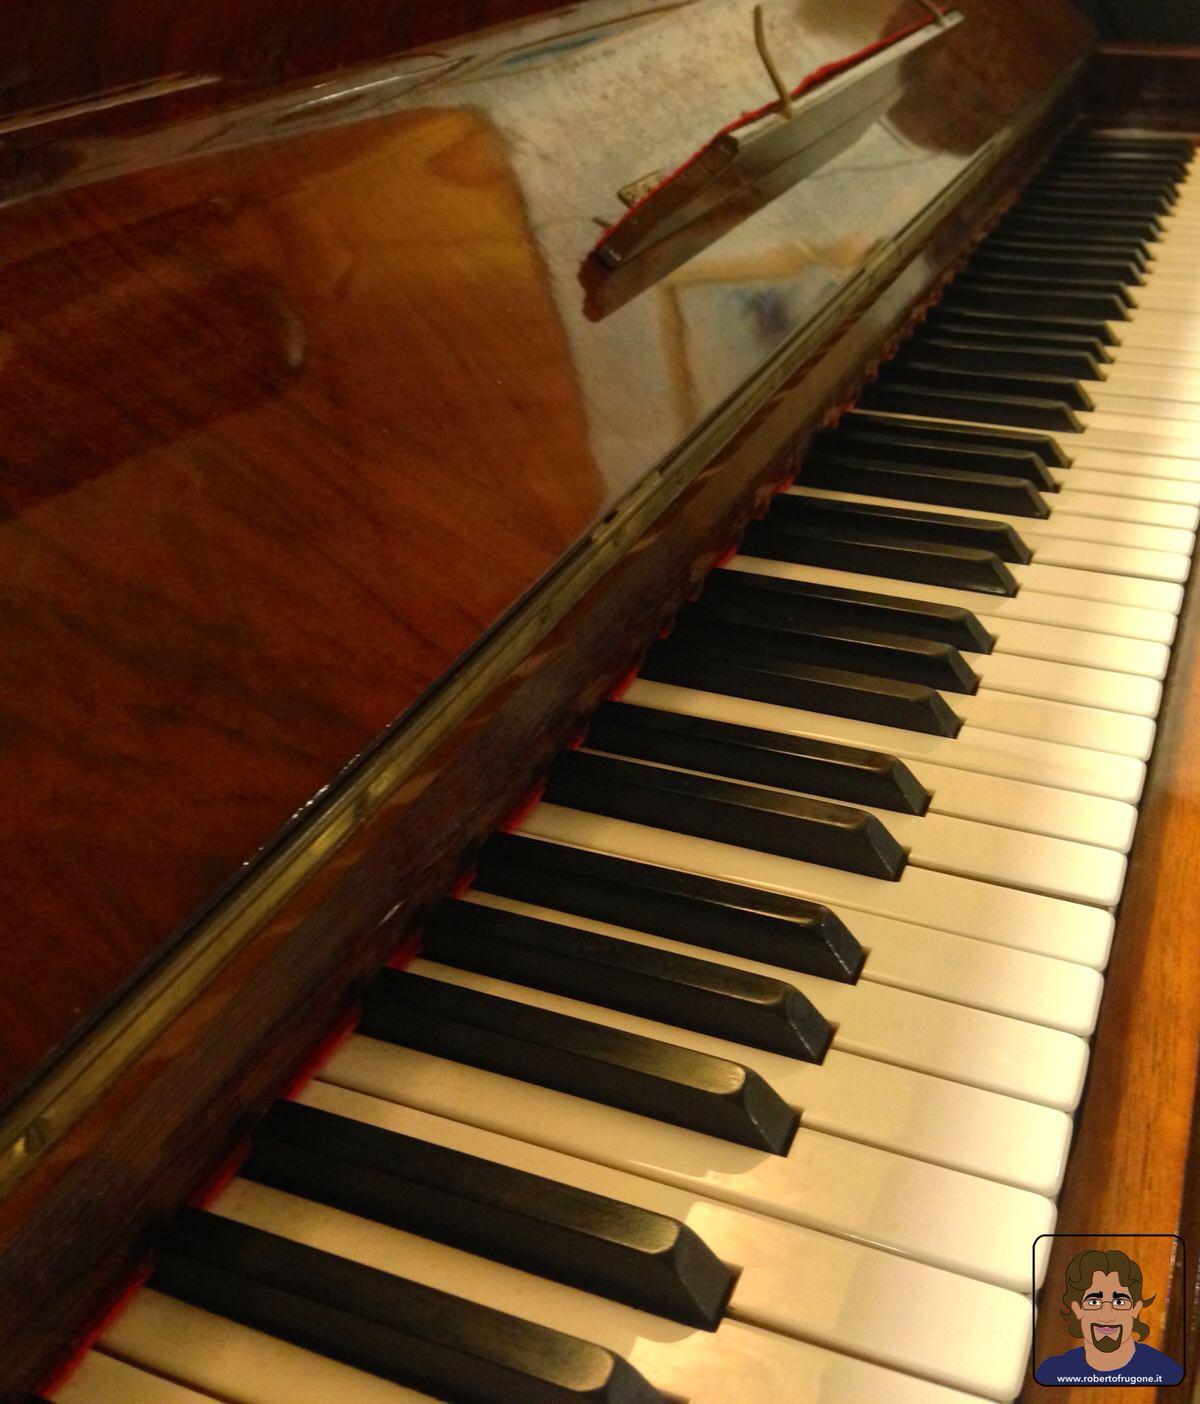 Totem Studio Sala Prove Musicali Casarza Ligure tastiera pianoforte Imperial